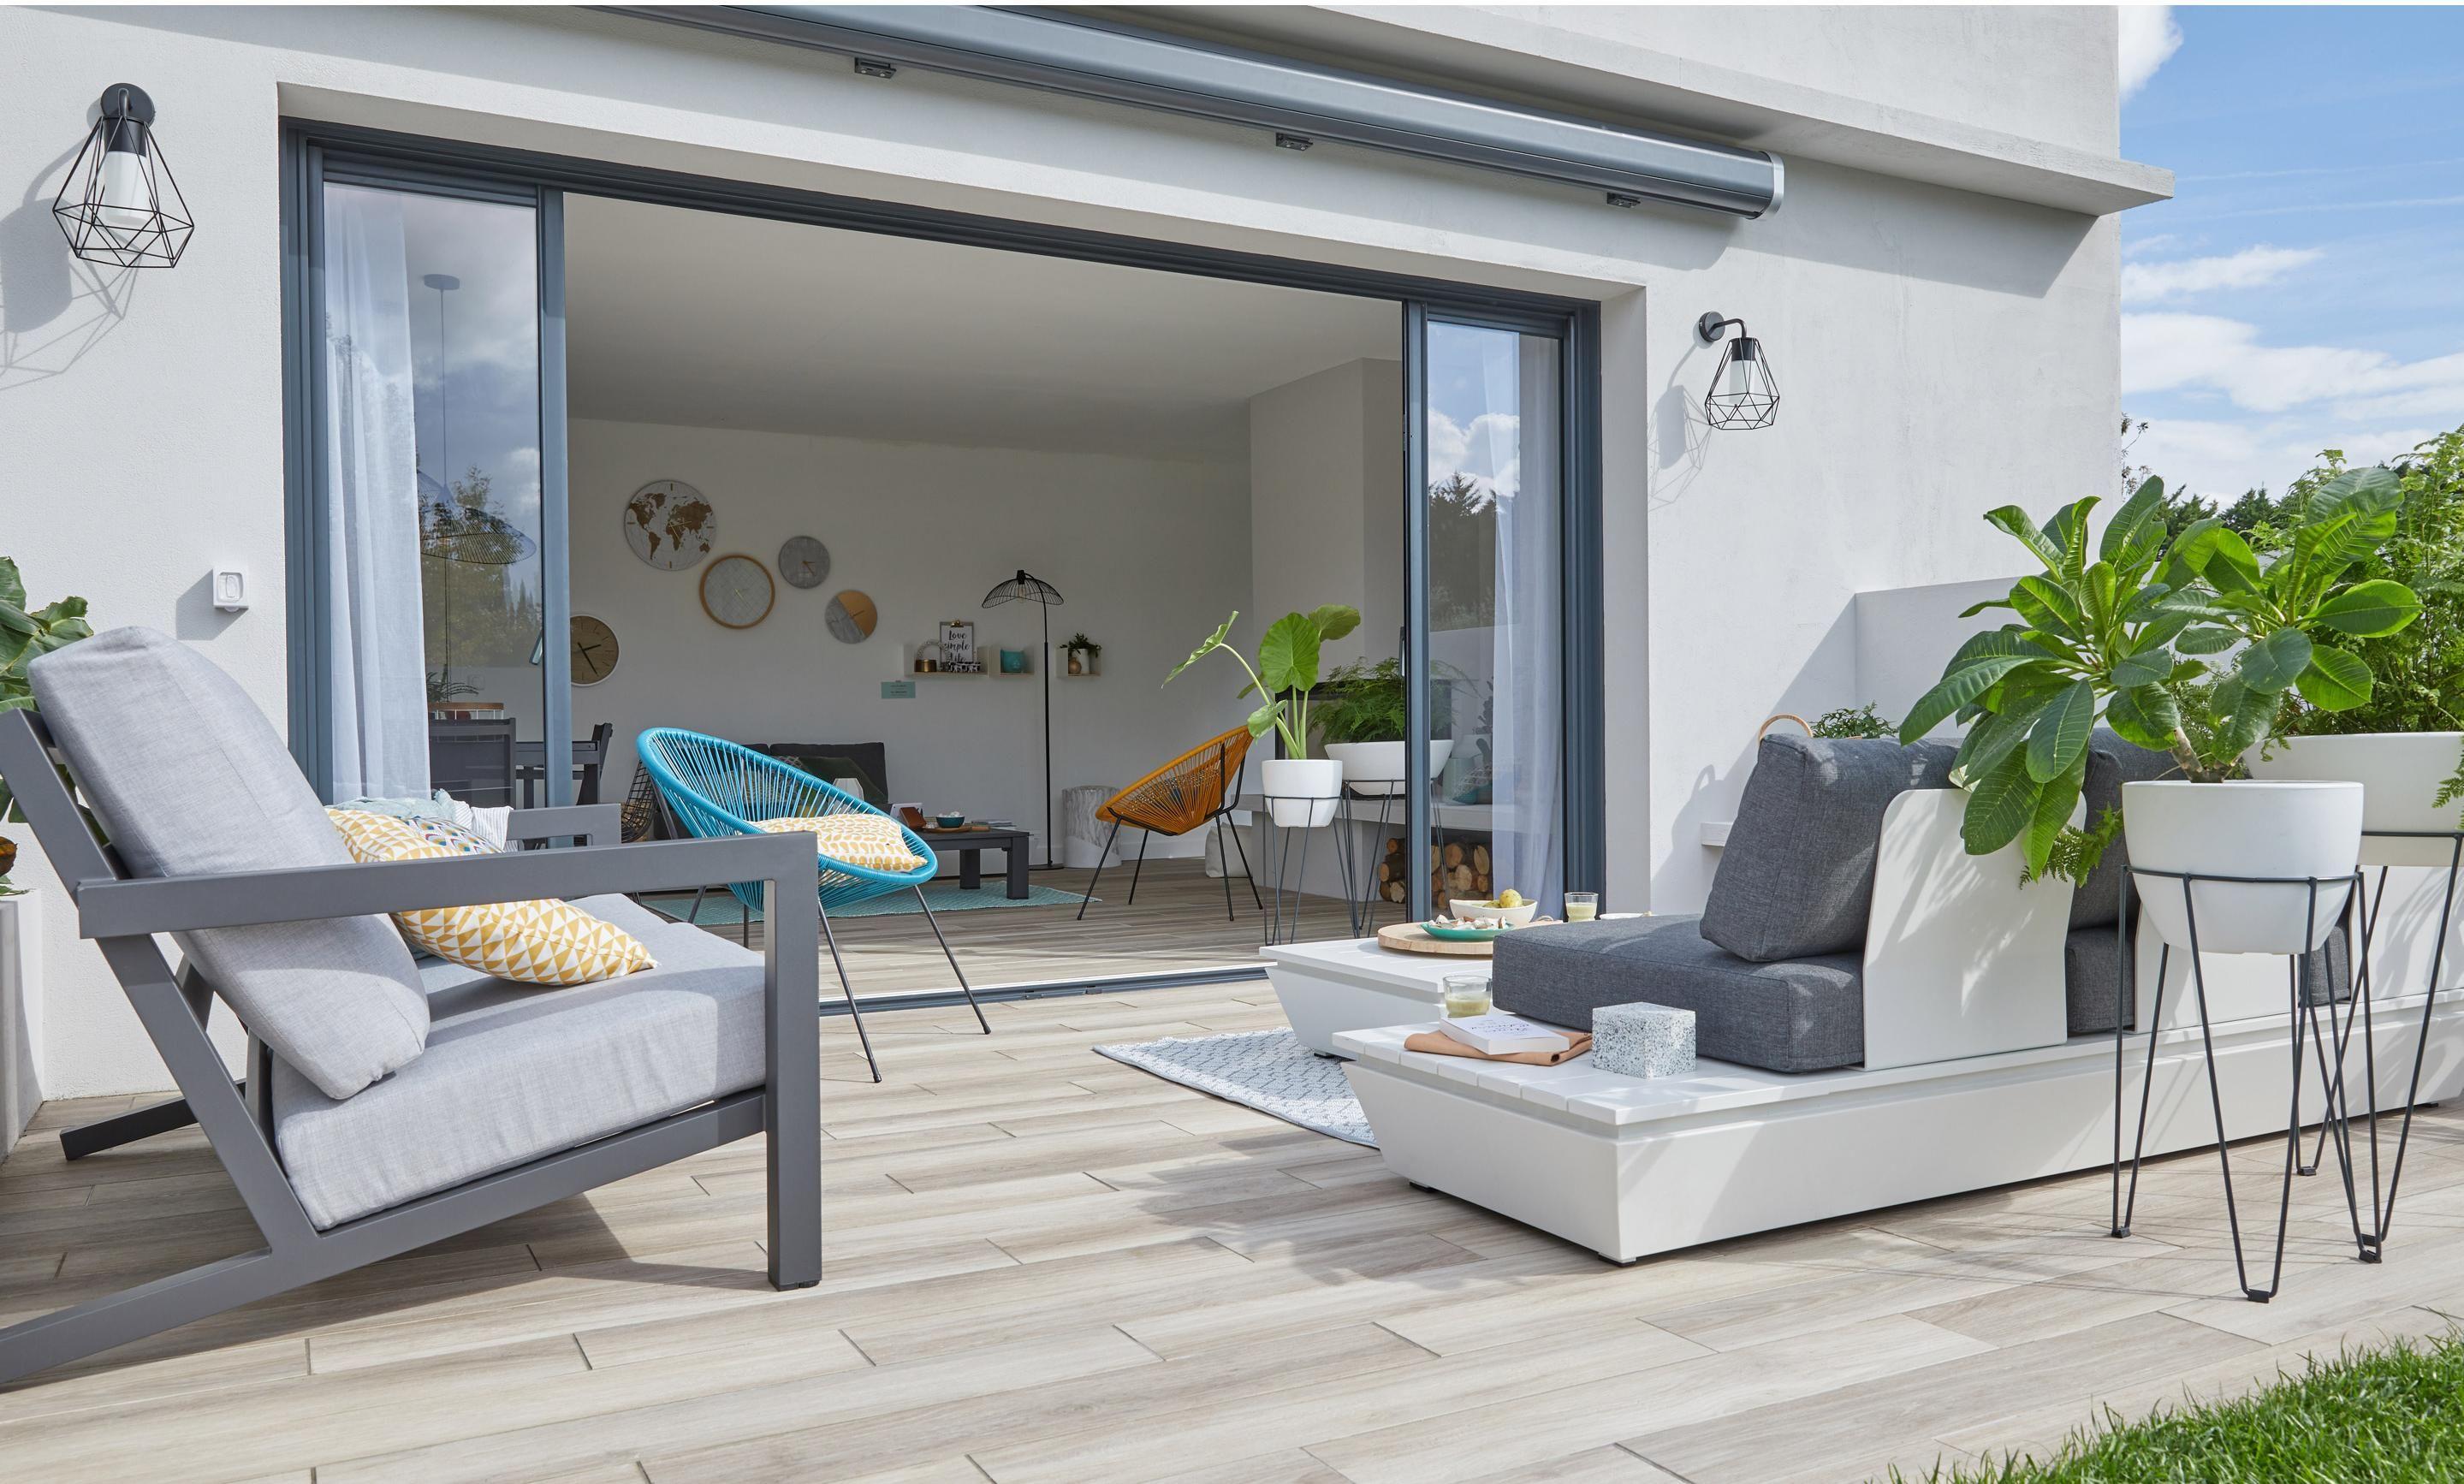 Salon bas de jardin Keros , 4 personnes | Products en 2019 ...